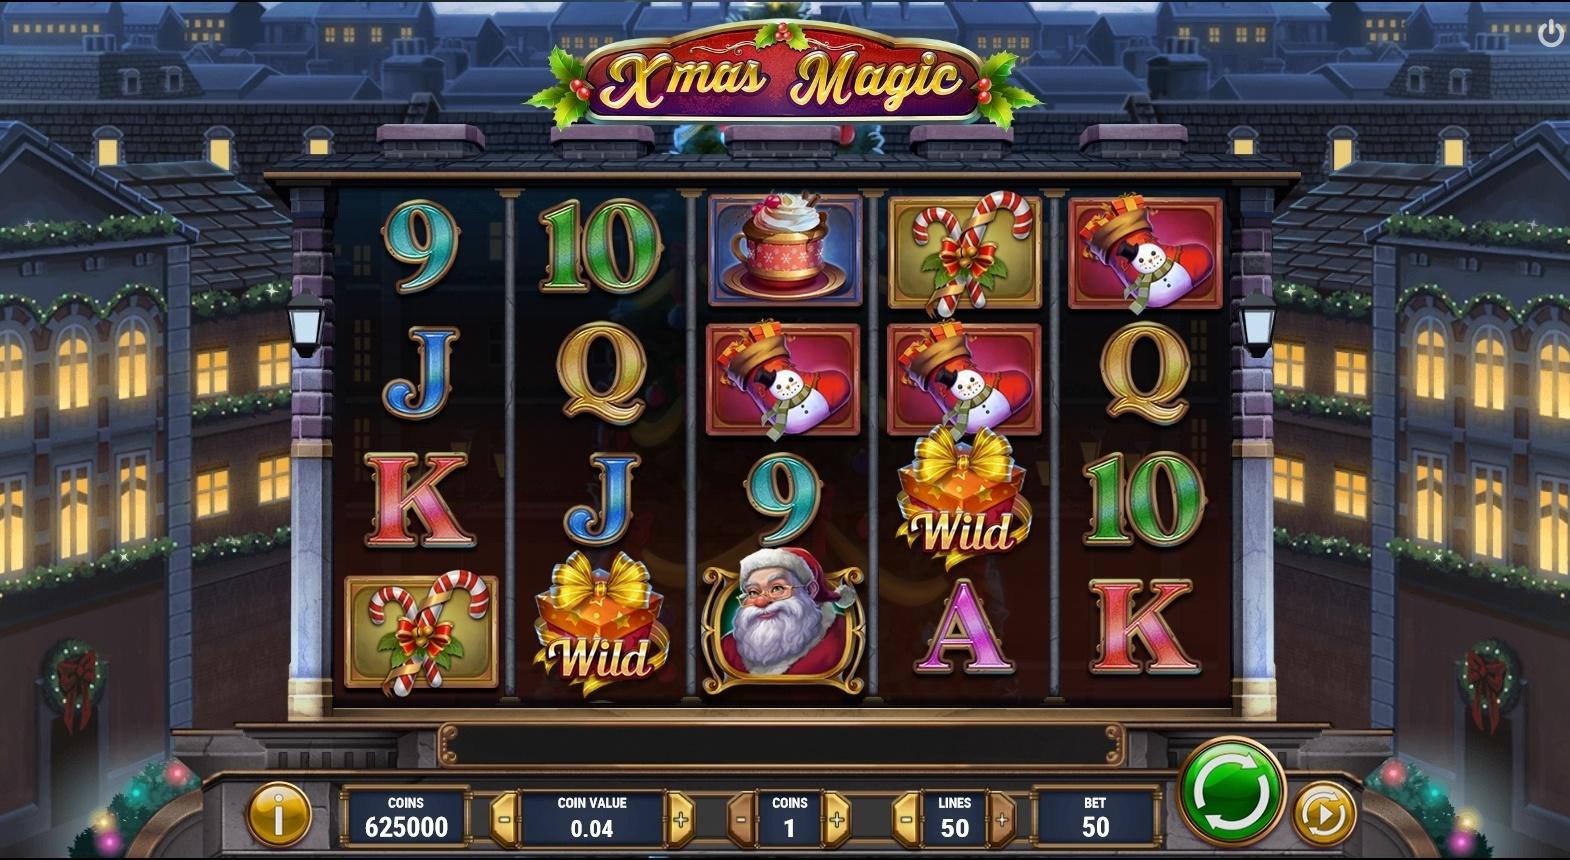 Xmas Magic Spielautomat online